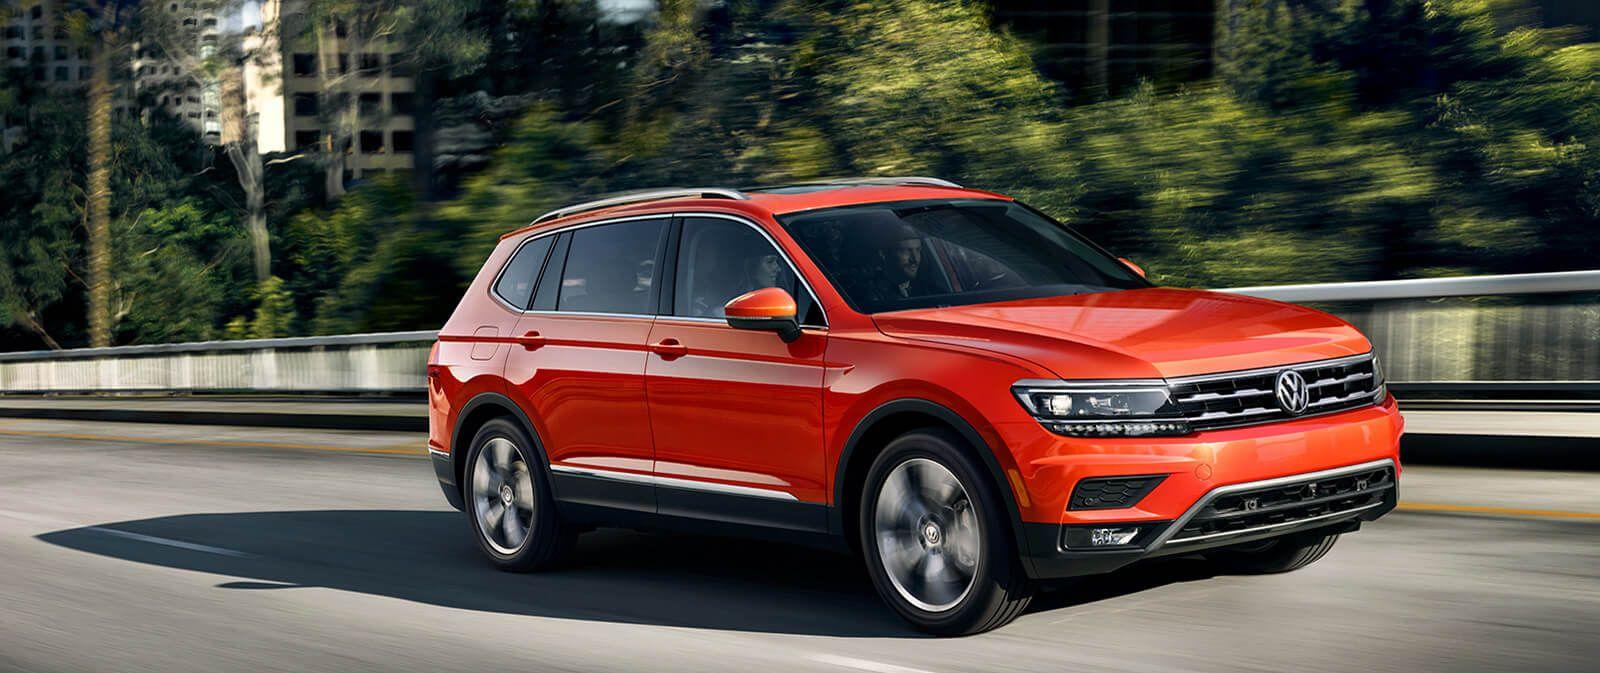 2019 Volkswagen Tiguan Leasing near Greenbelt, MD